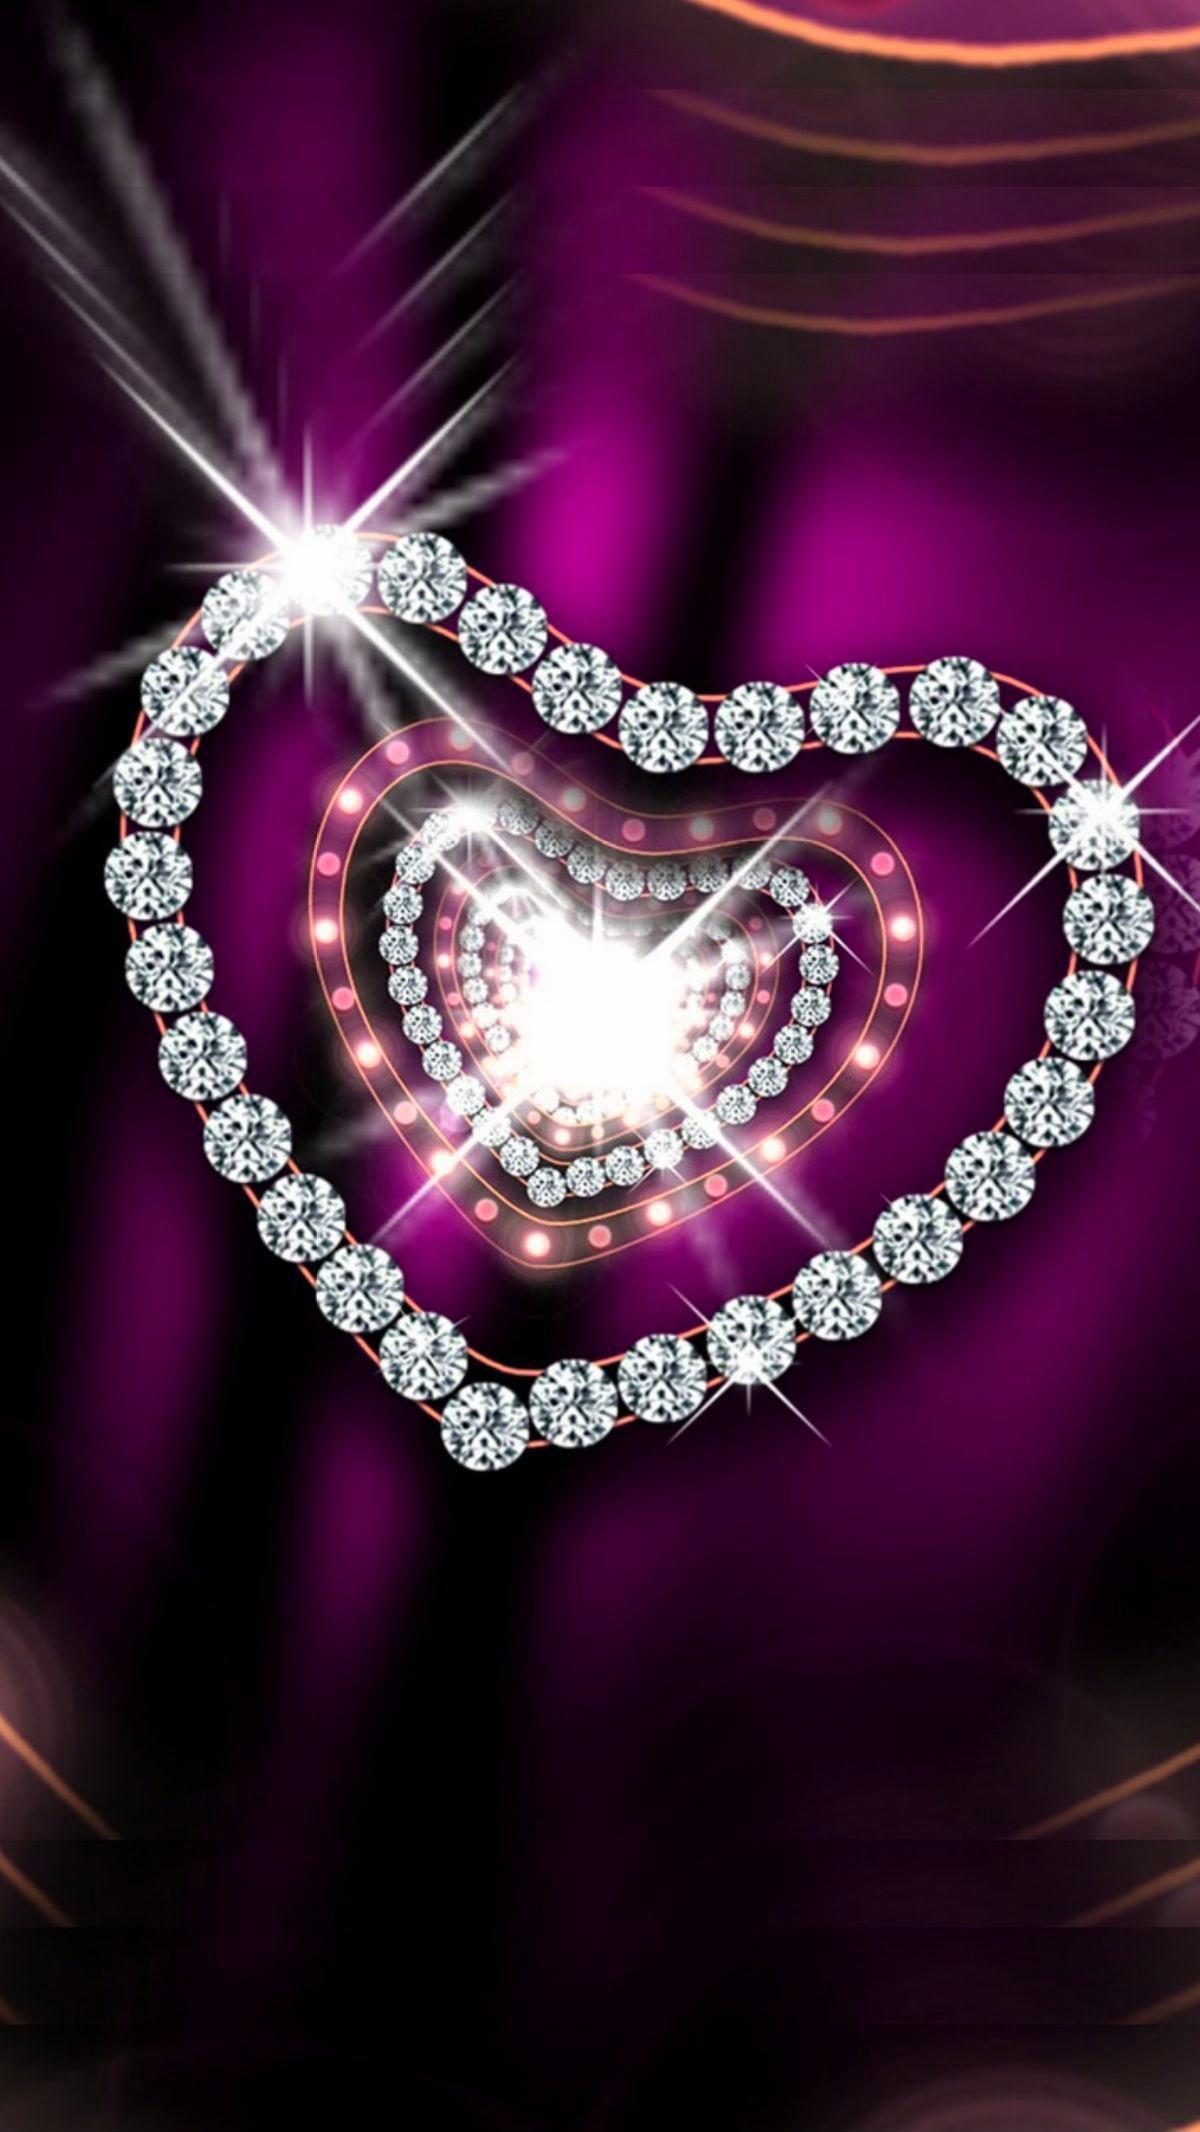 Purple and silver diamonds